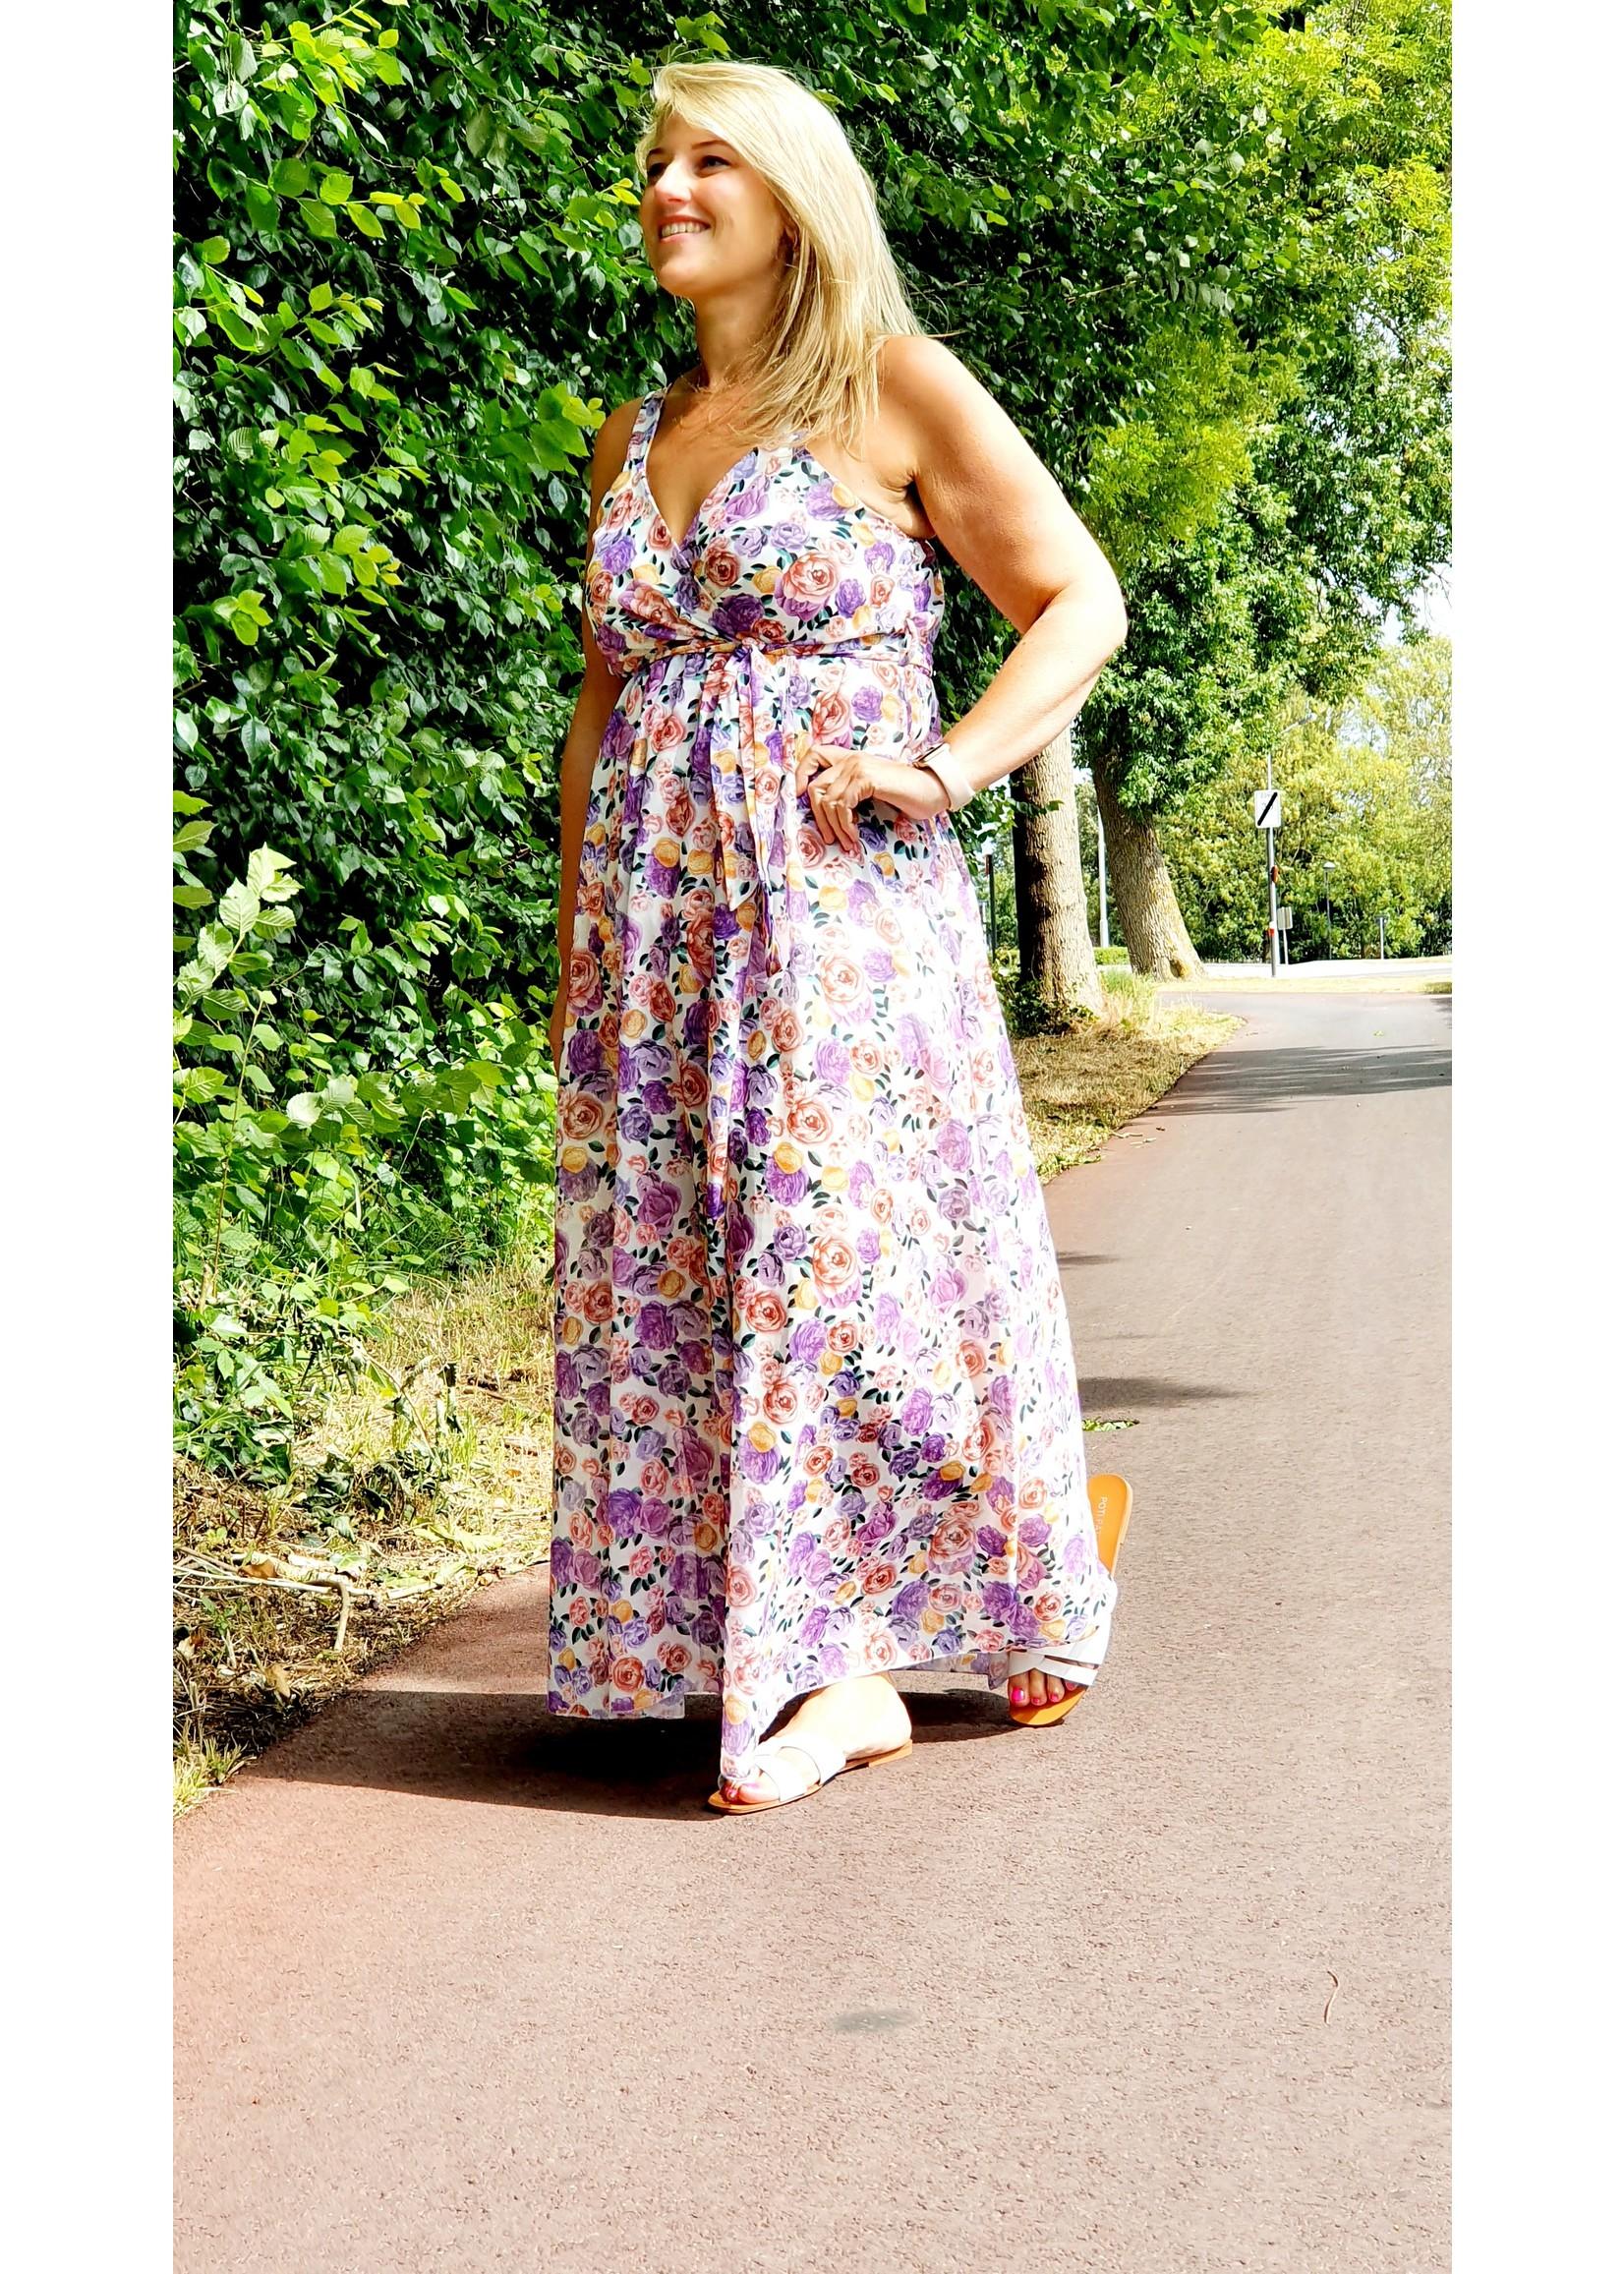 Thé feeling summer lilac dress